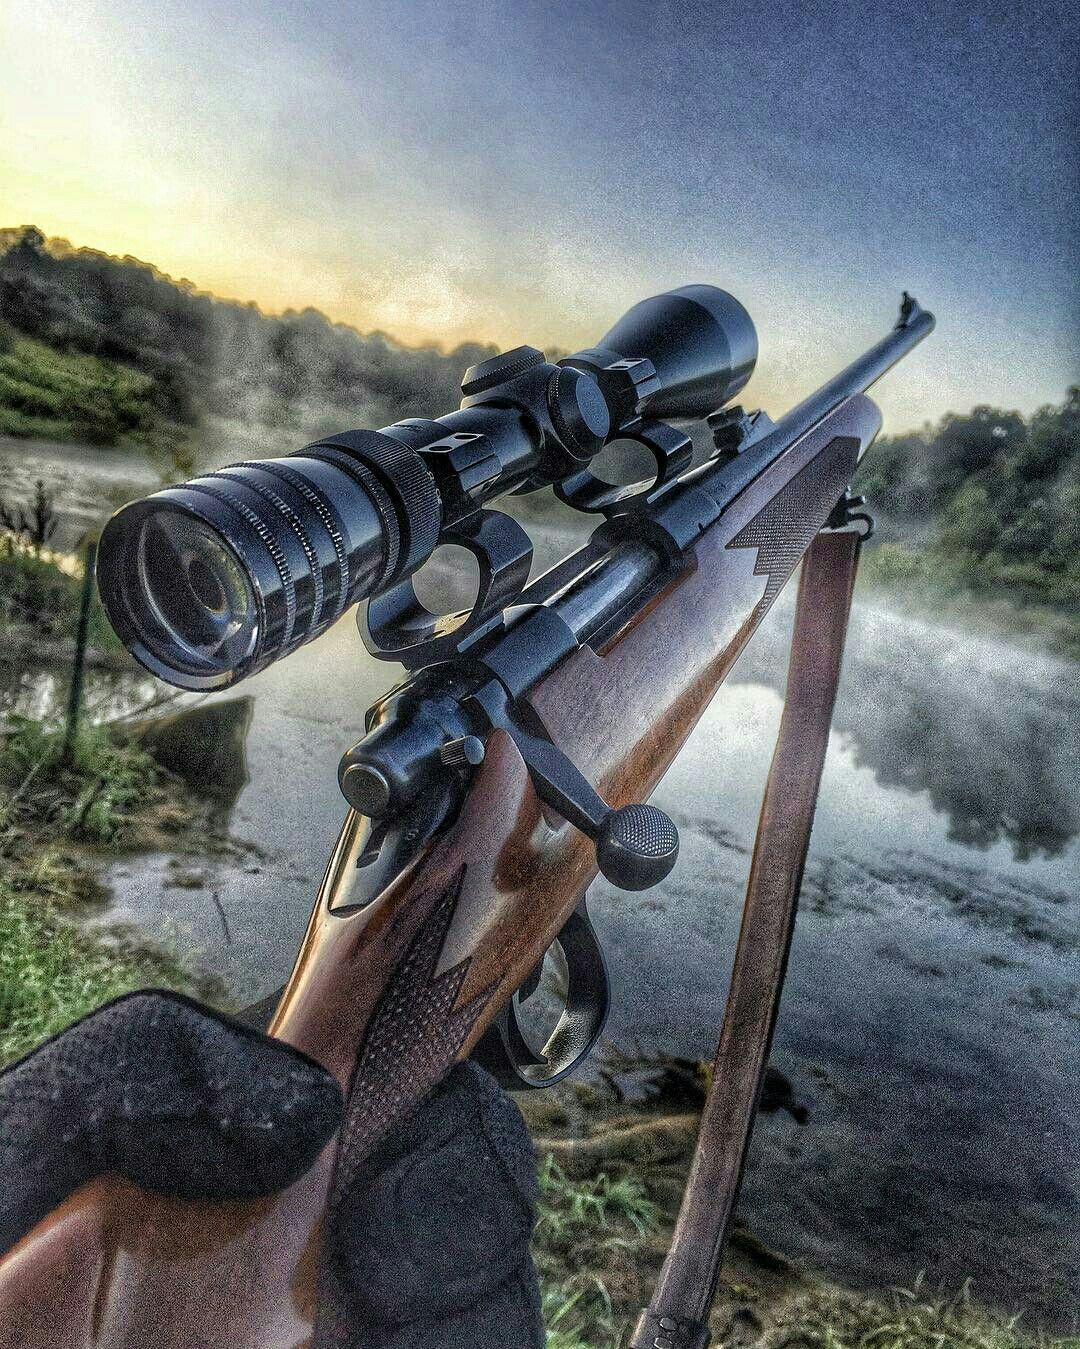 Pin by Evan Kuhel on Guns | Guns, Airsoft sniper, Hunting guns